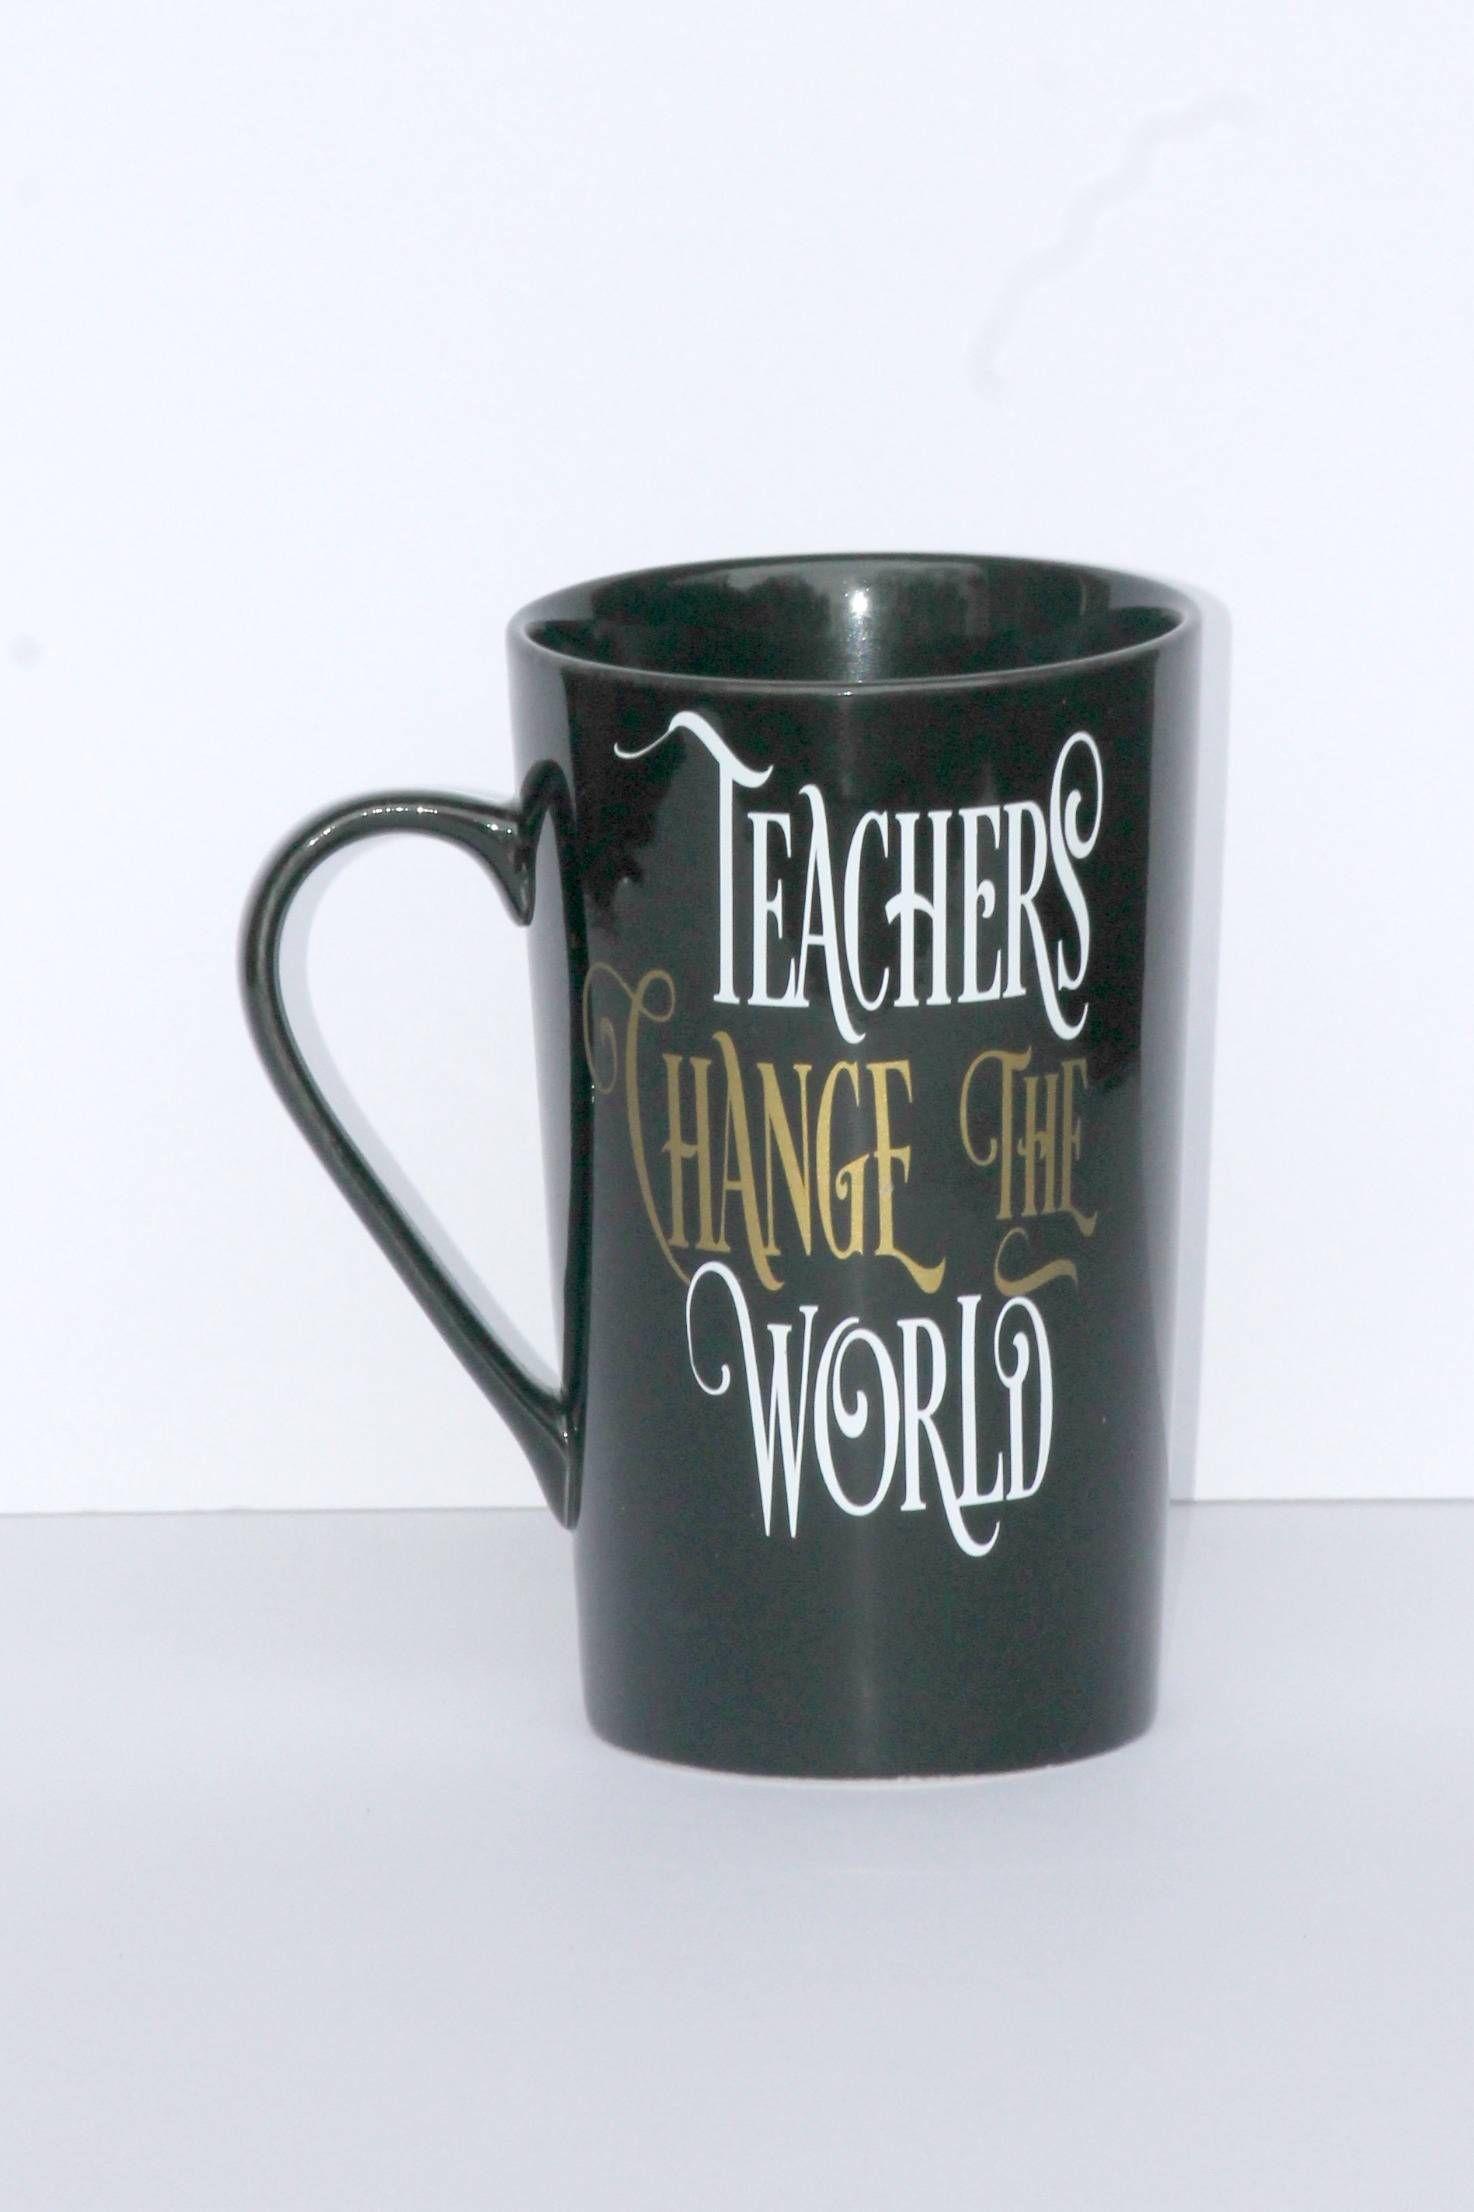 Teachers Change The World Lg Black Coffee Cup